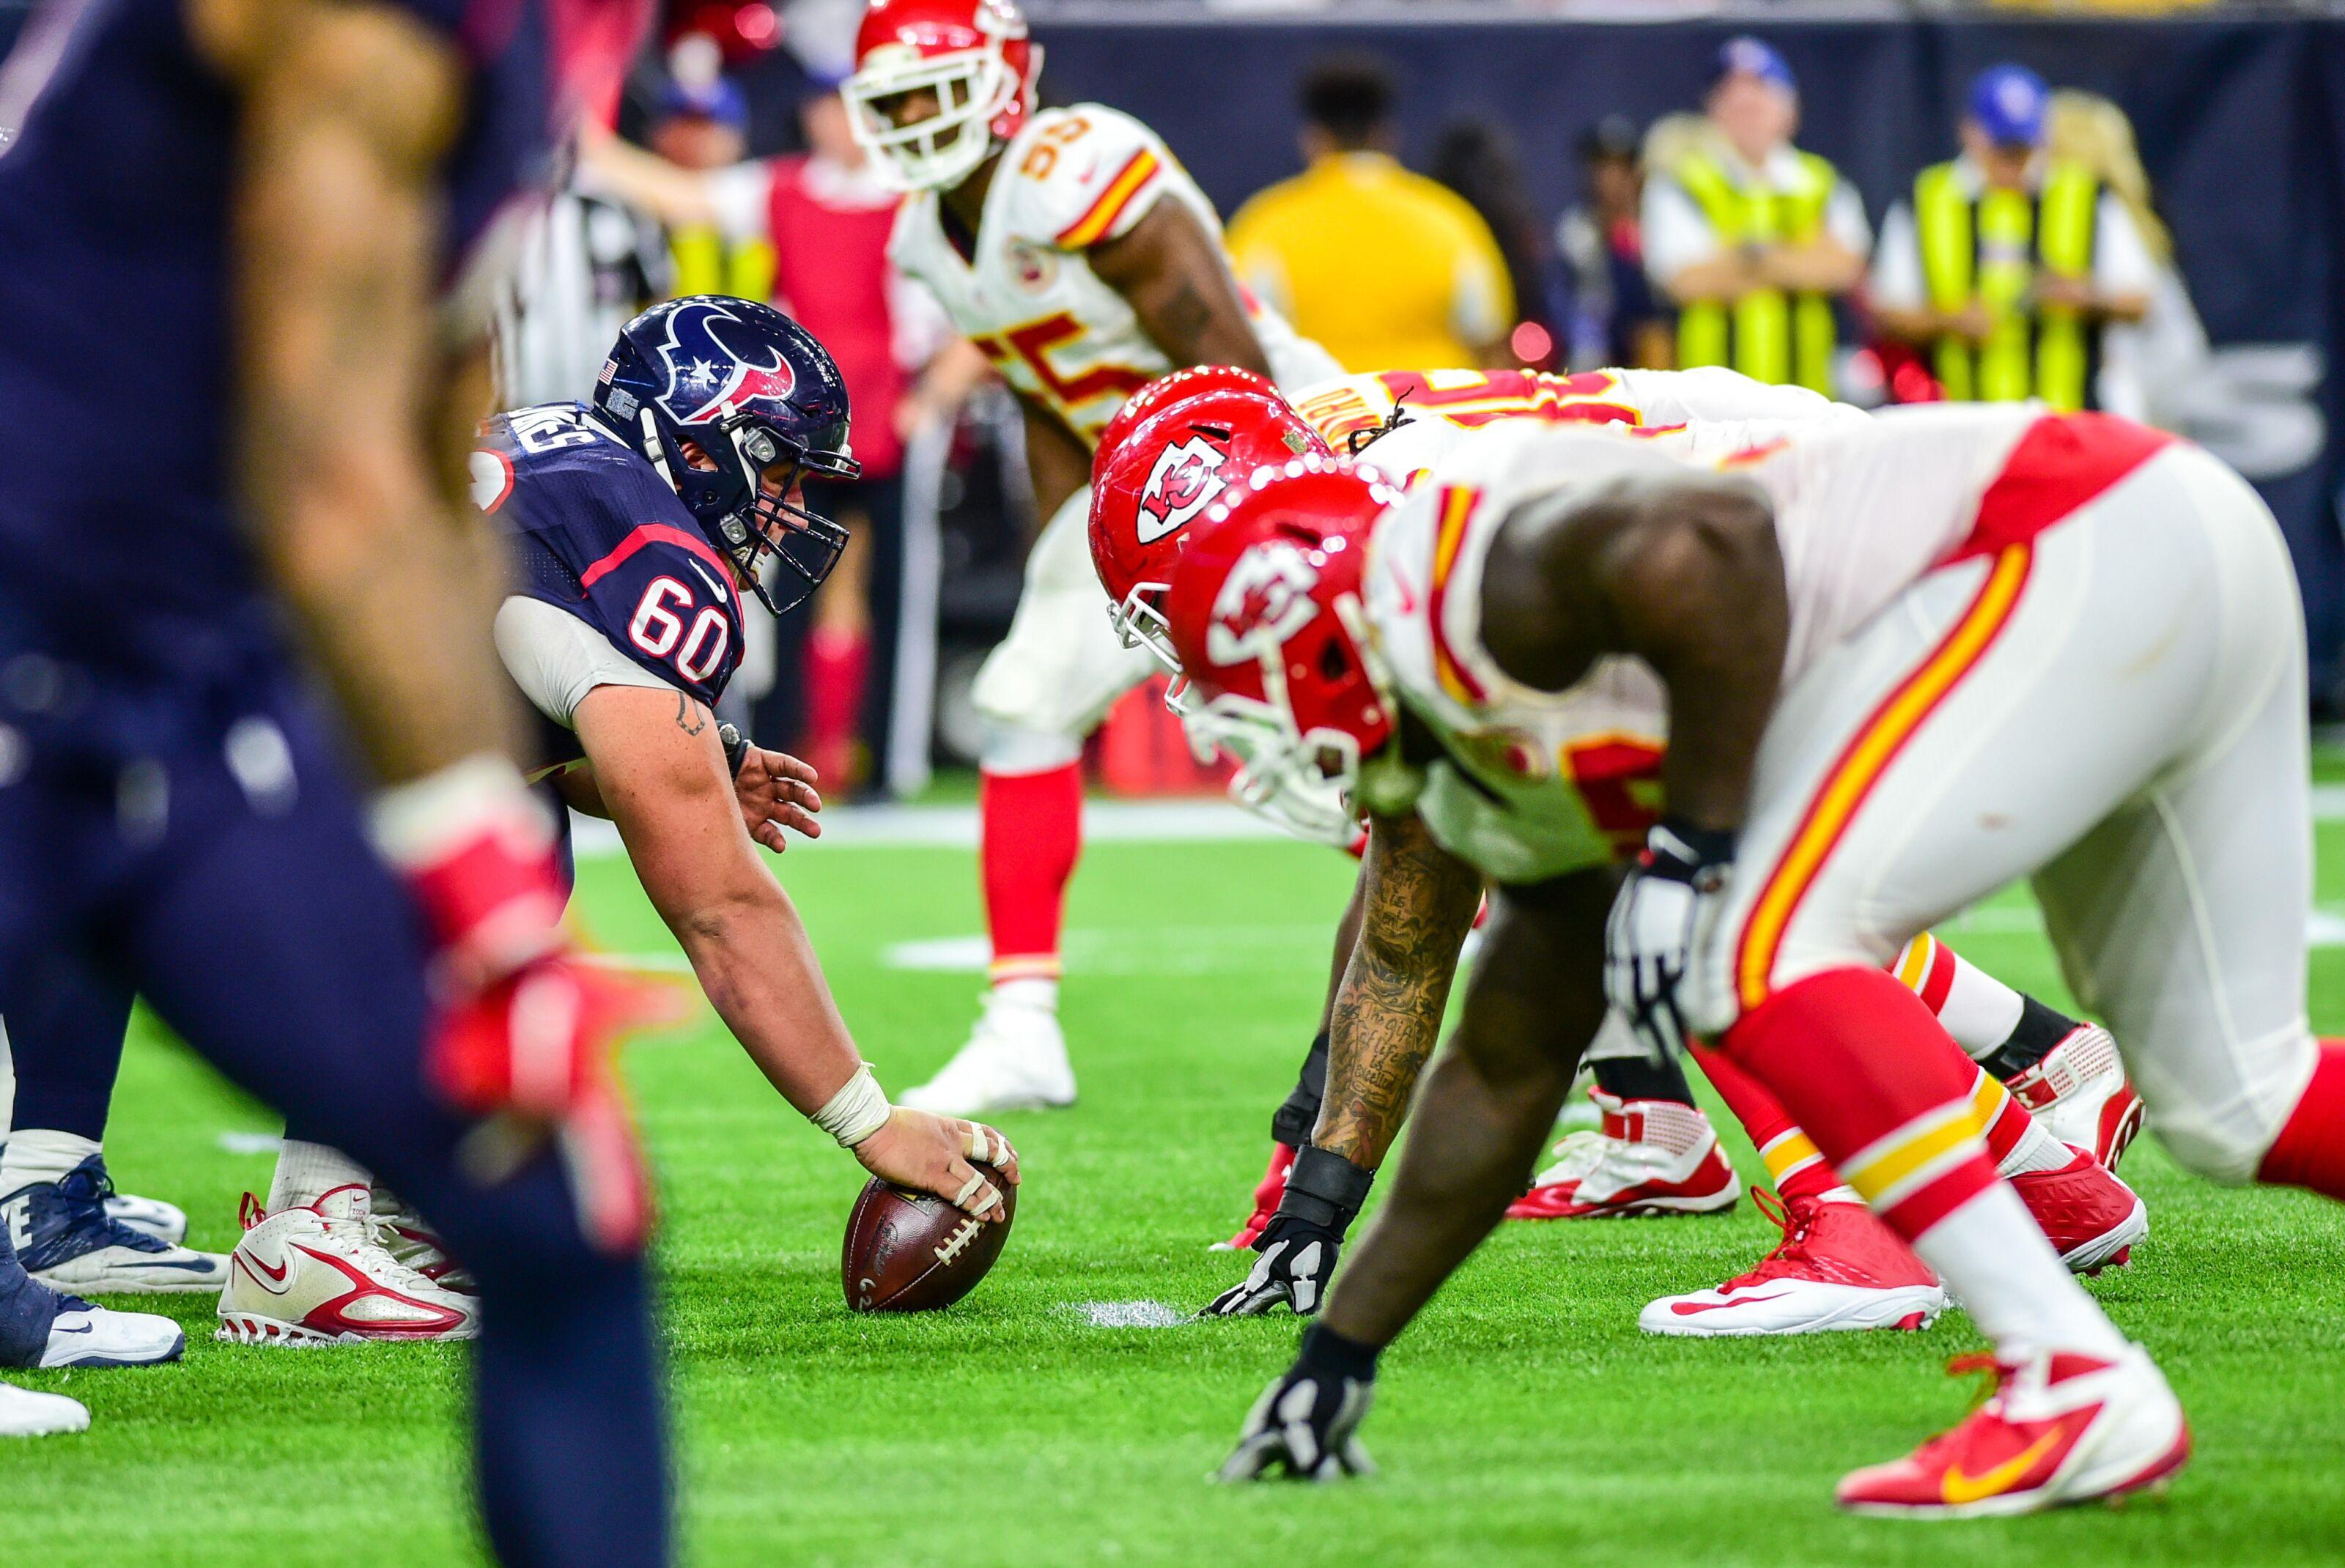 Kansas City Chiefs: Madden Simulation for Week 6 vs Texans